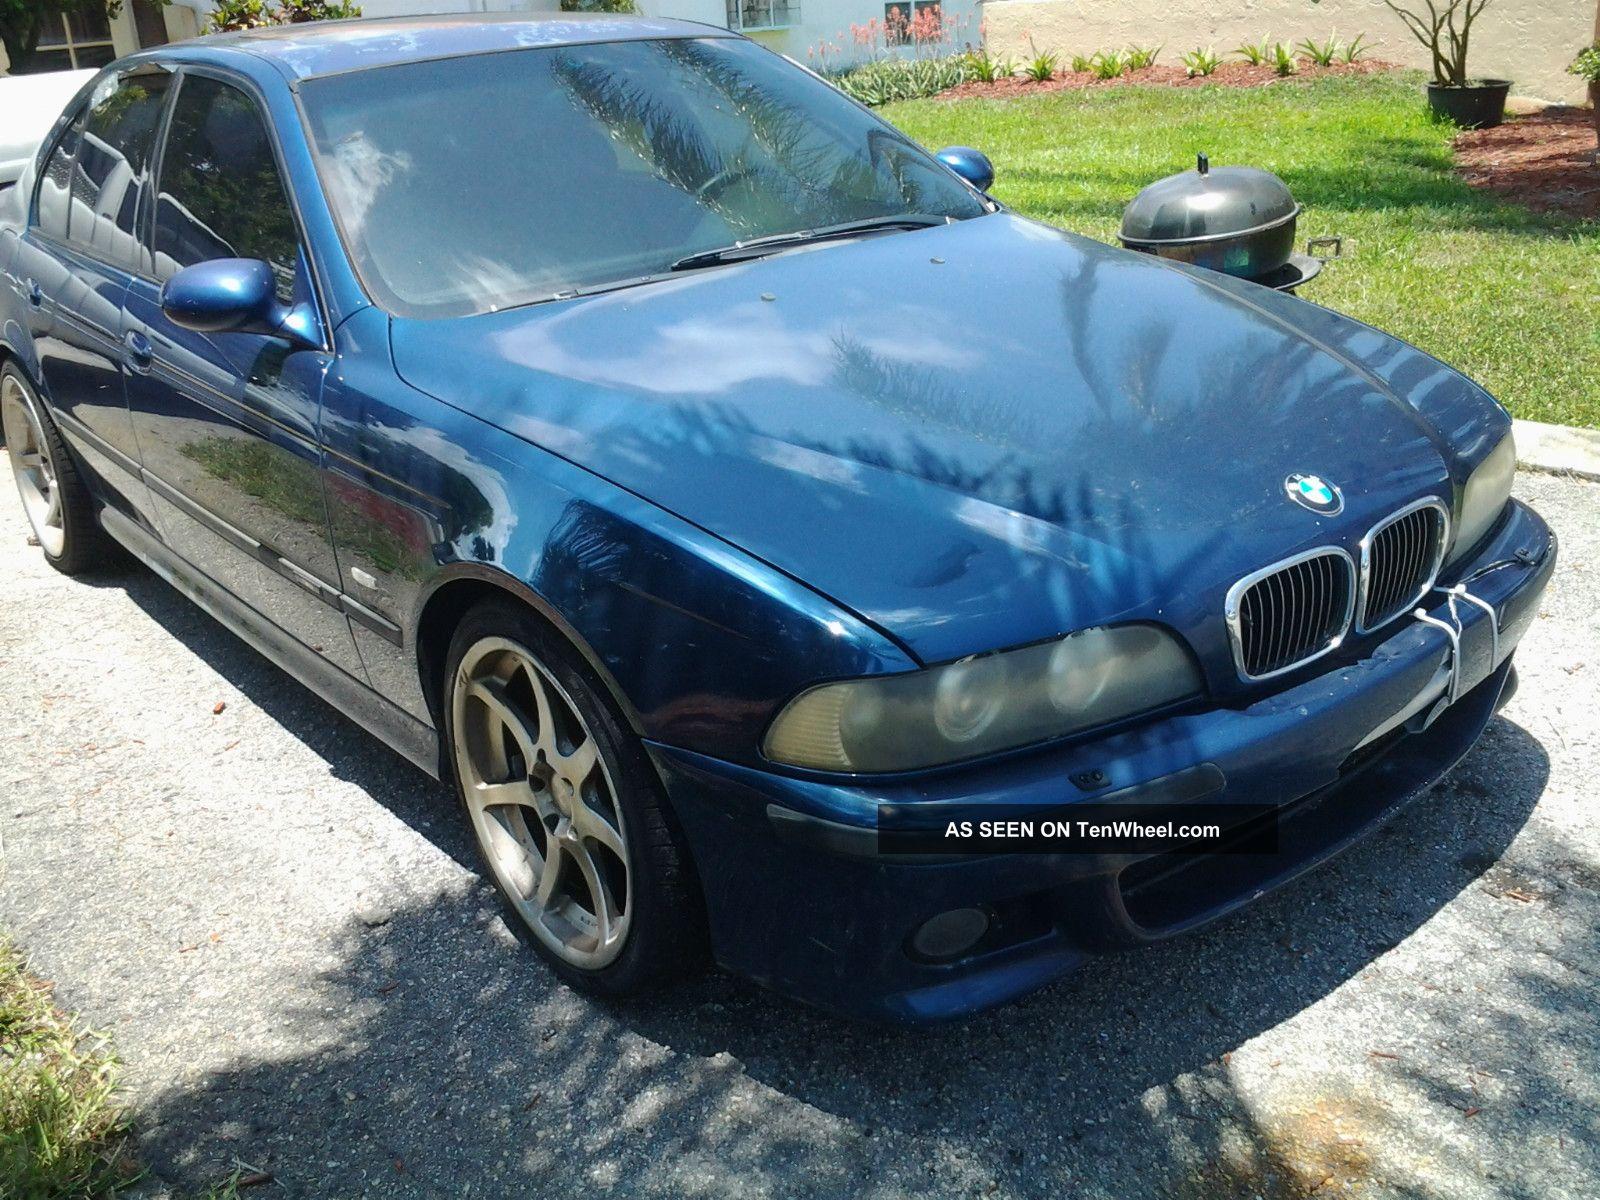 2000 Bmw M5 Sedan Blue M5 photo